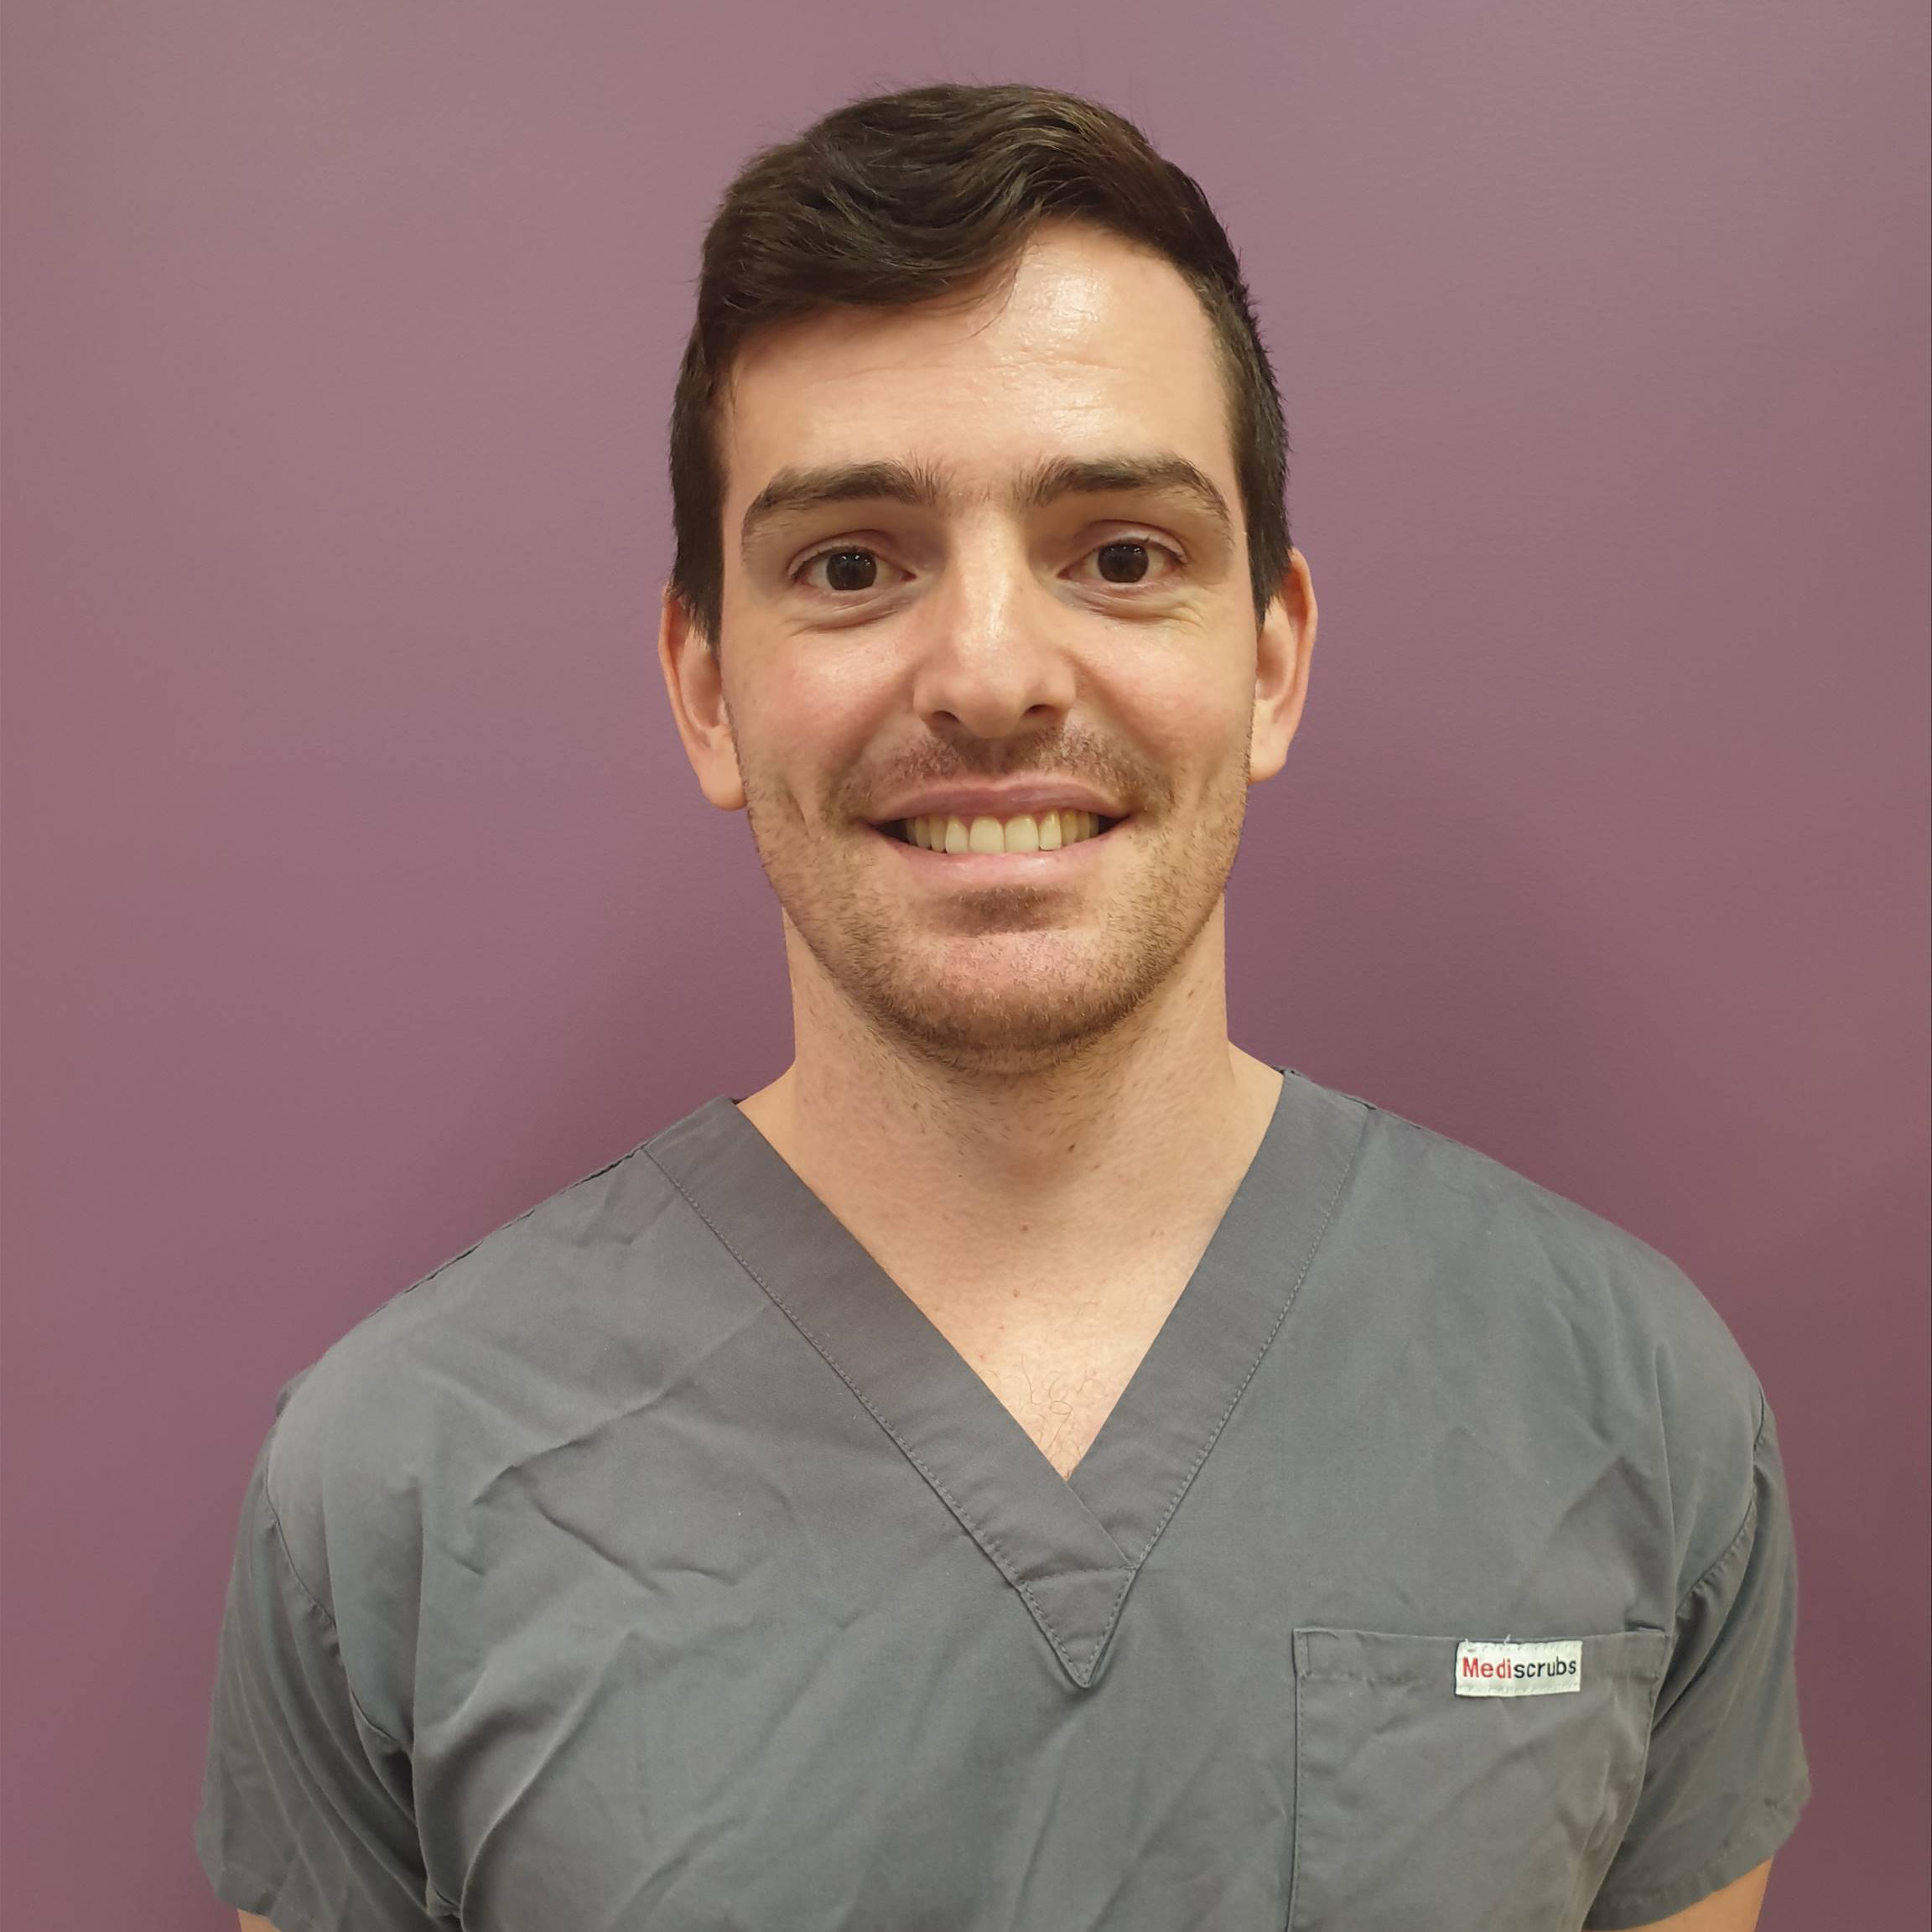 Portrait image of Dr Jack Gilpin wearing Mediscrubs smiling